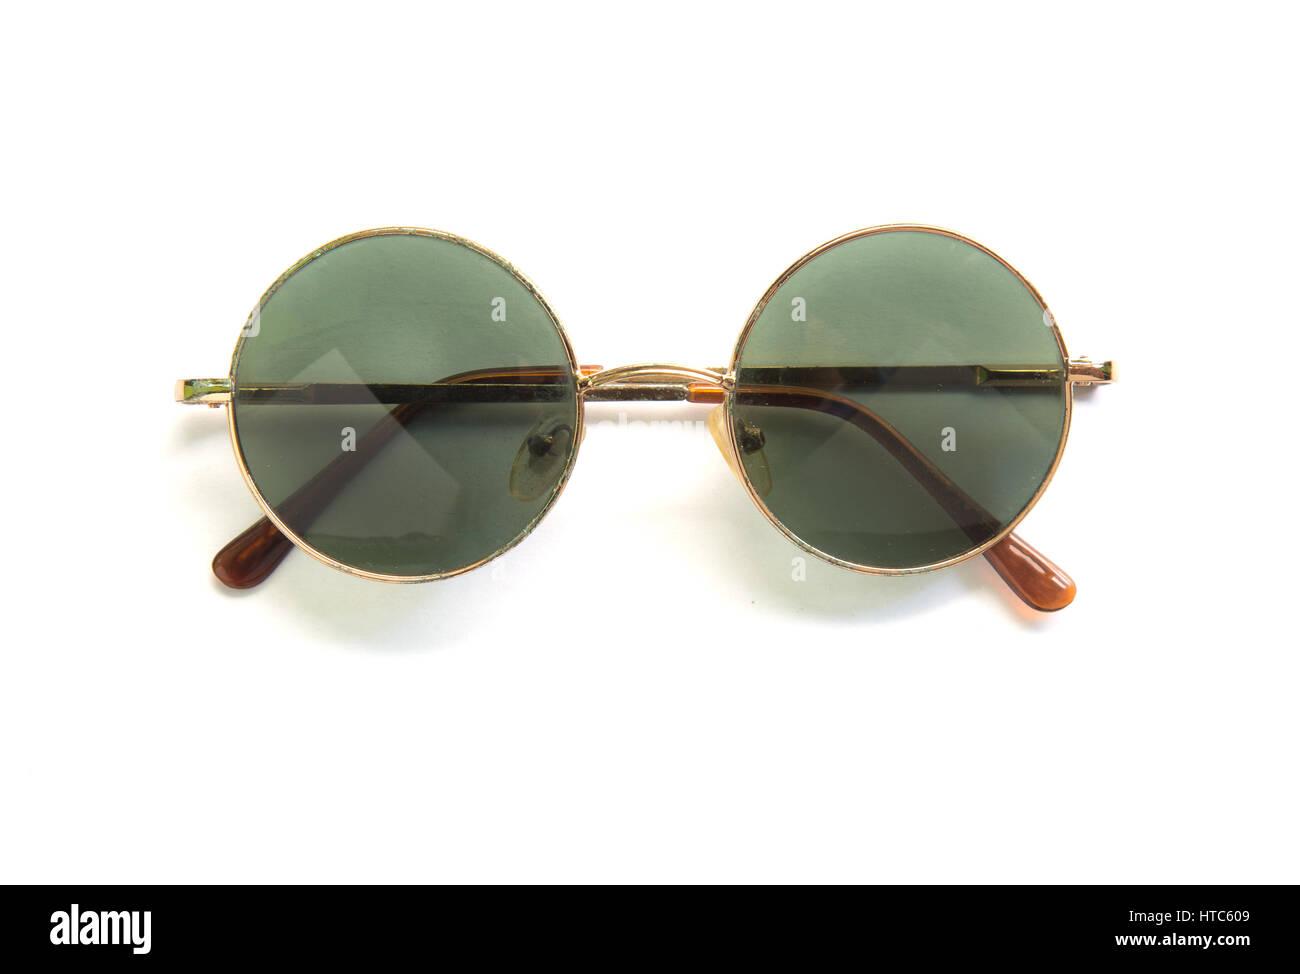 Round Black Framed Glasses Imágenes De Stock & Round Black Framed ...